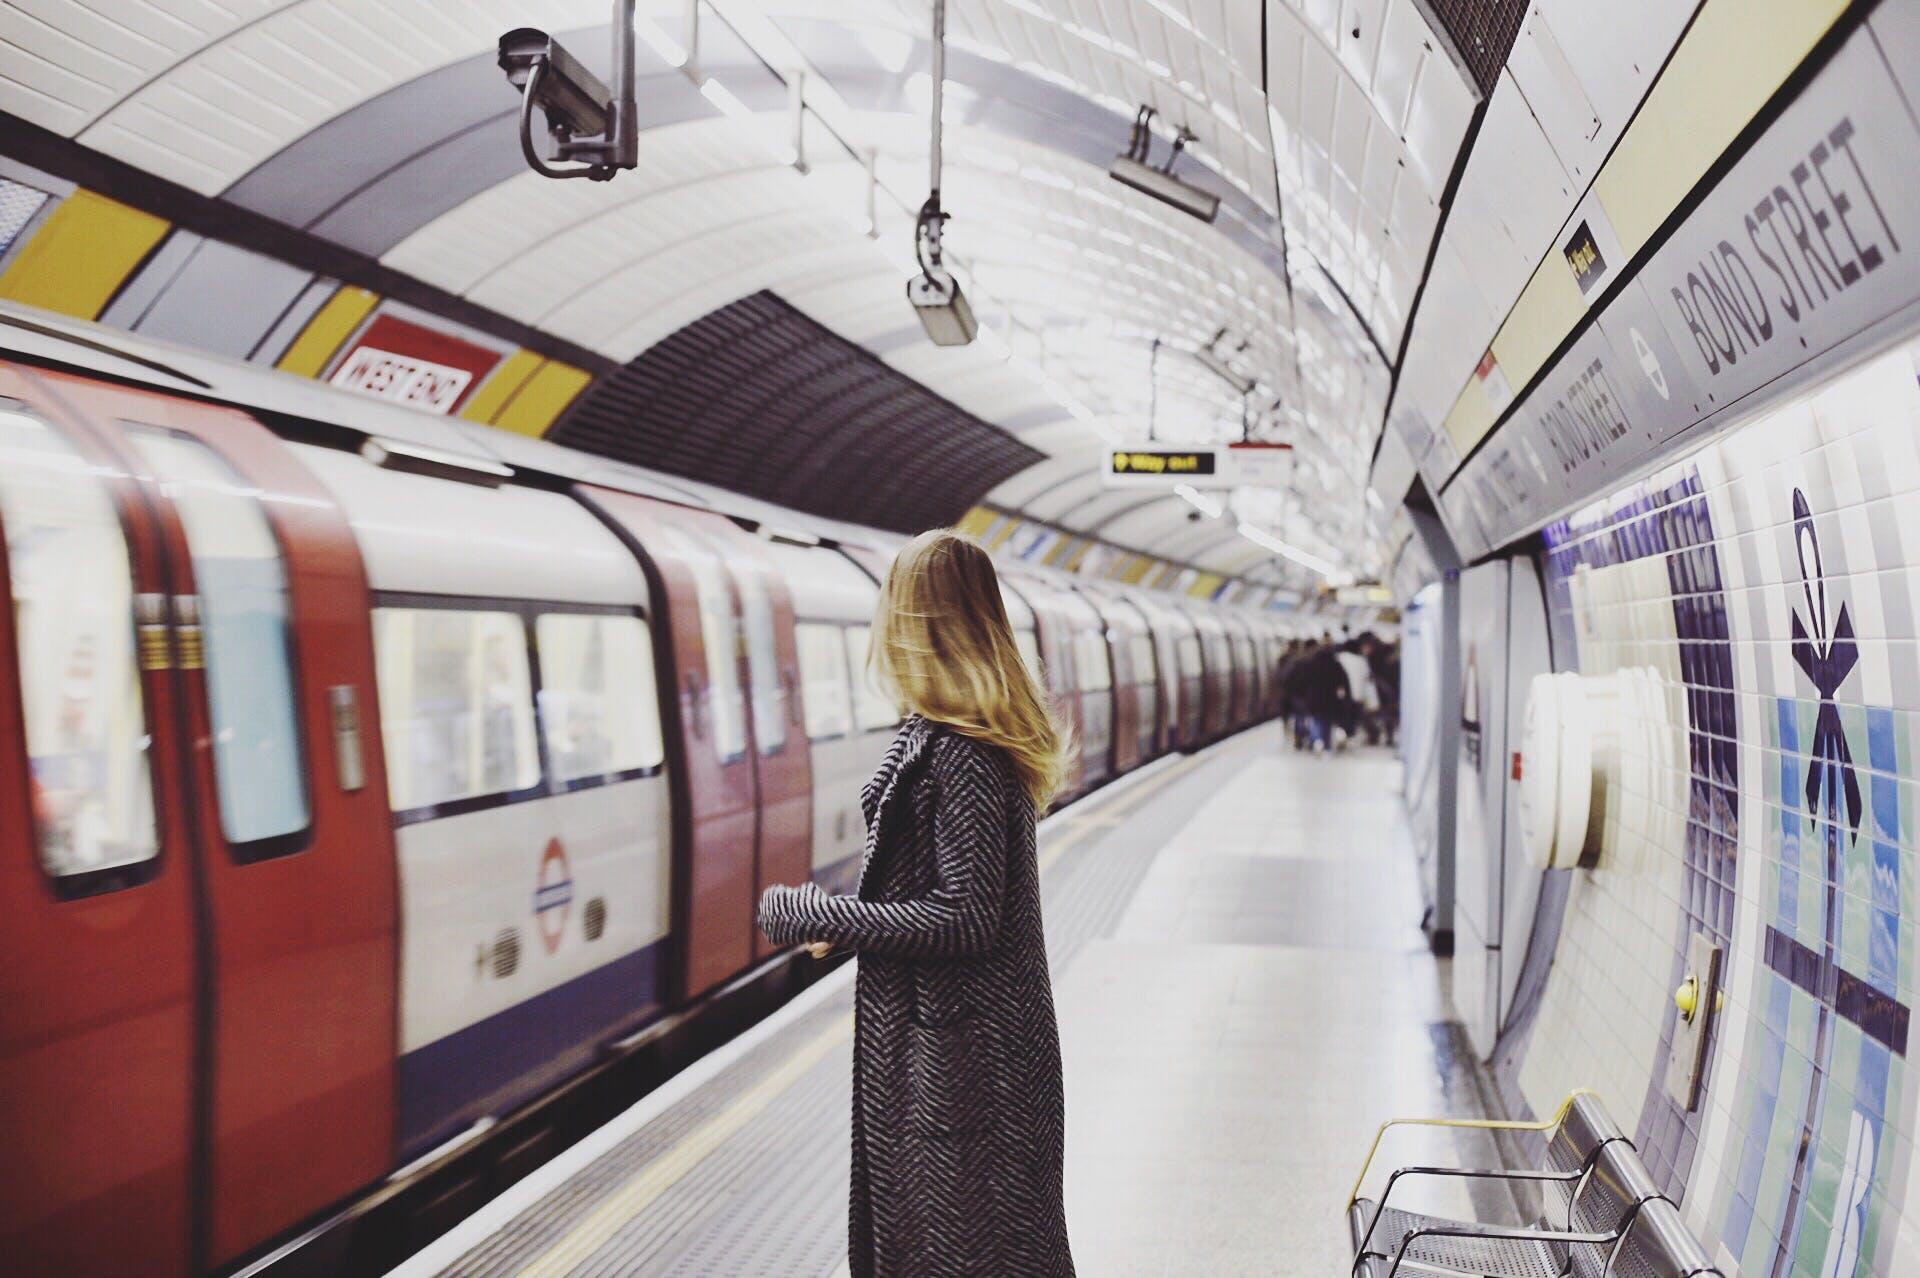 day trip solo lady travel ideas